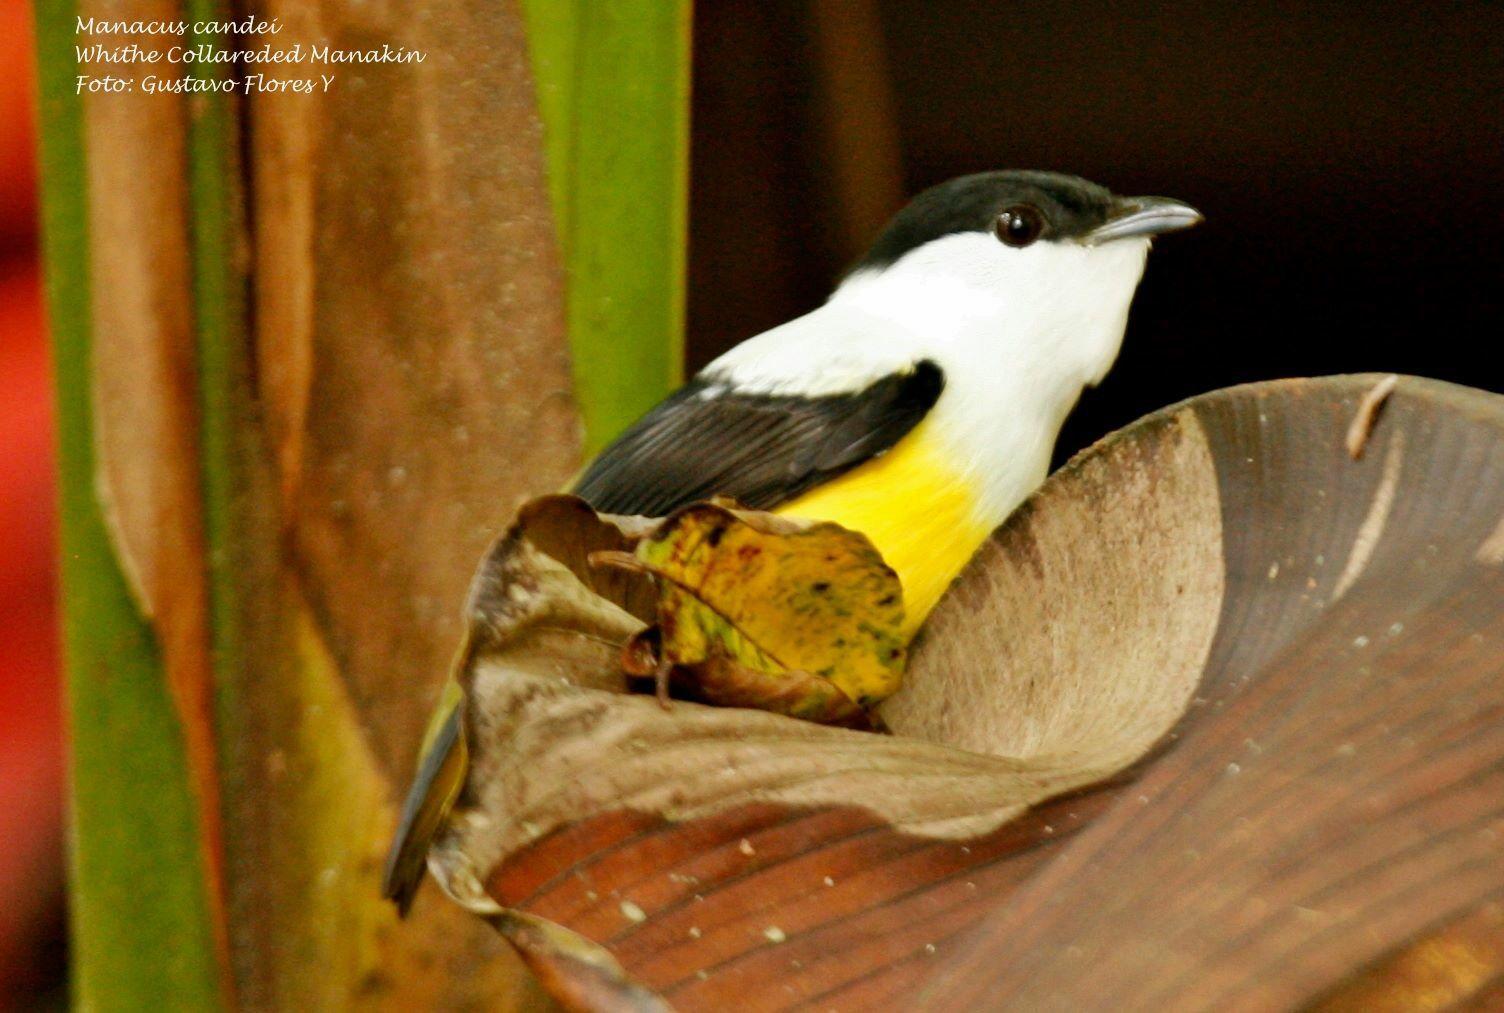 Manacus candei. White collared Manakin. #Aves #Birds #Costaricanbirds